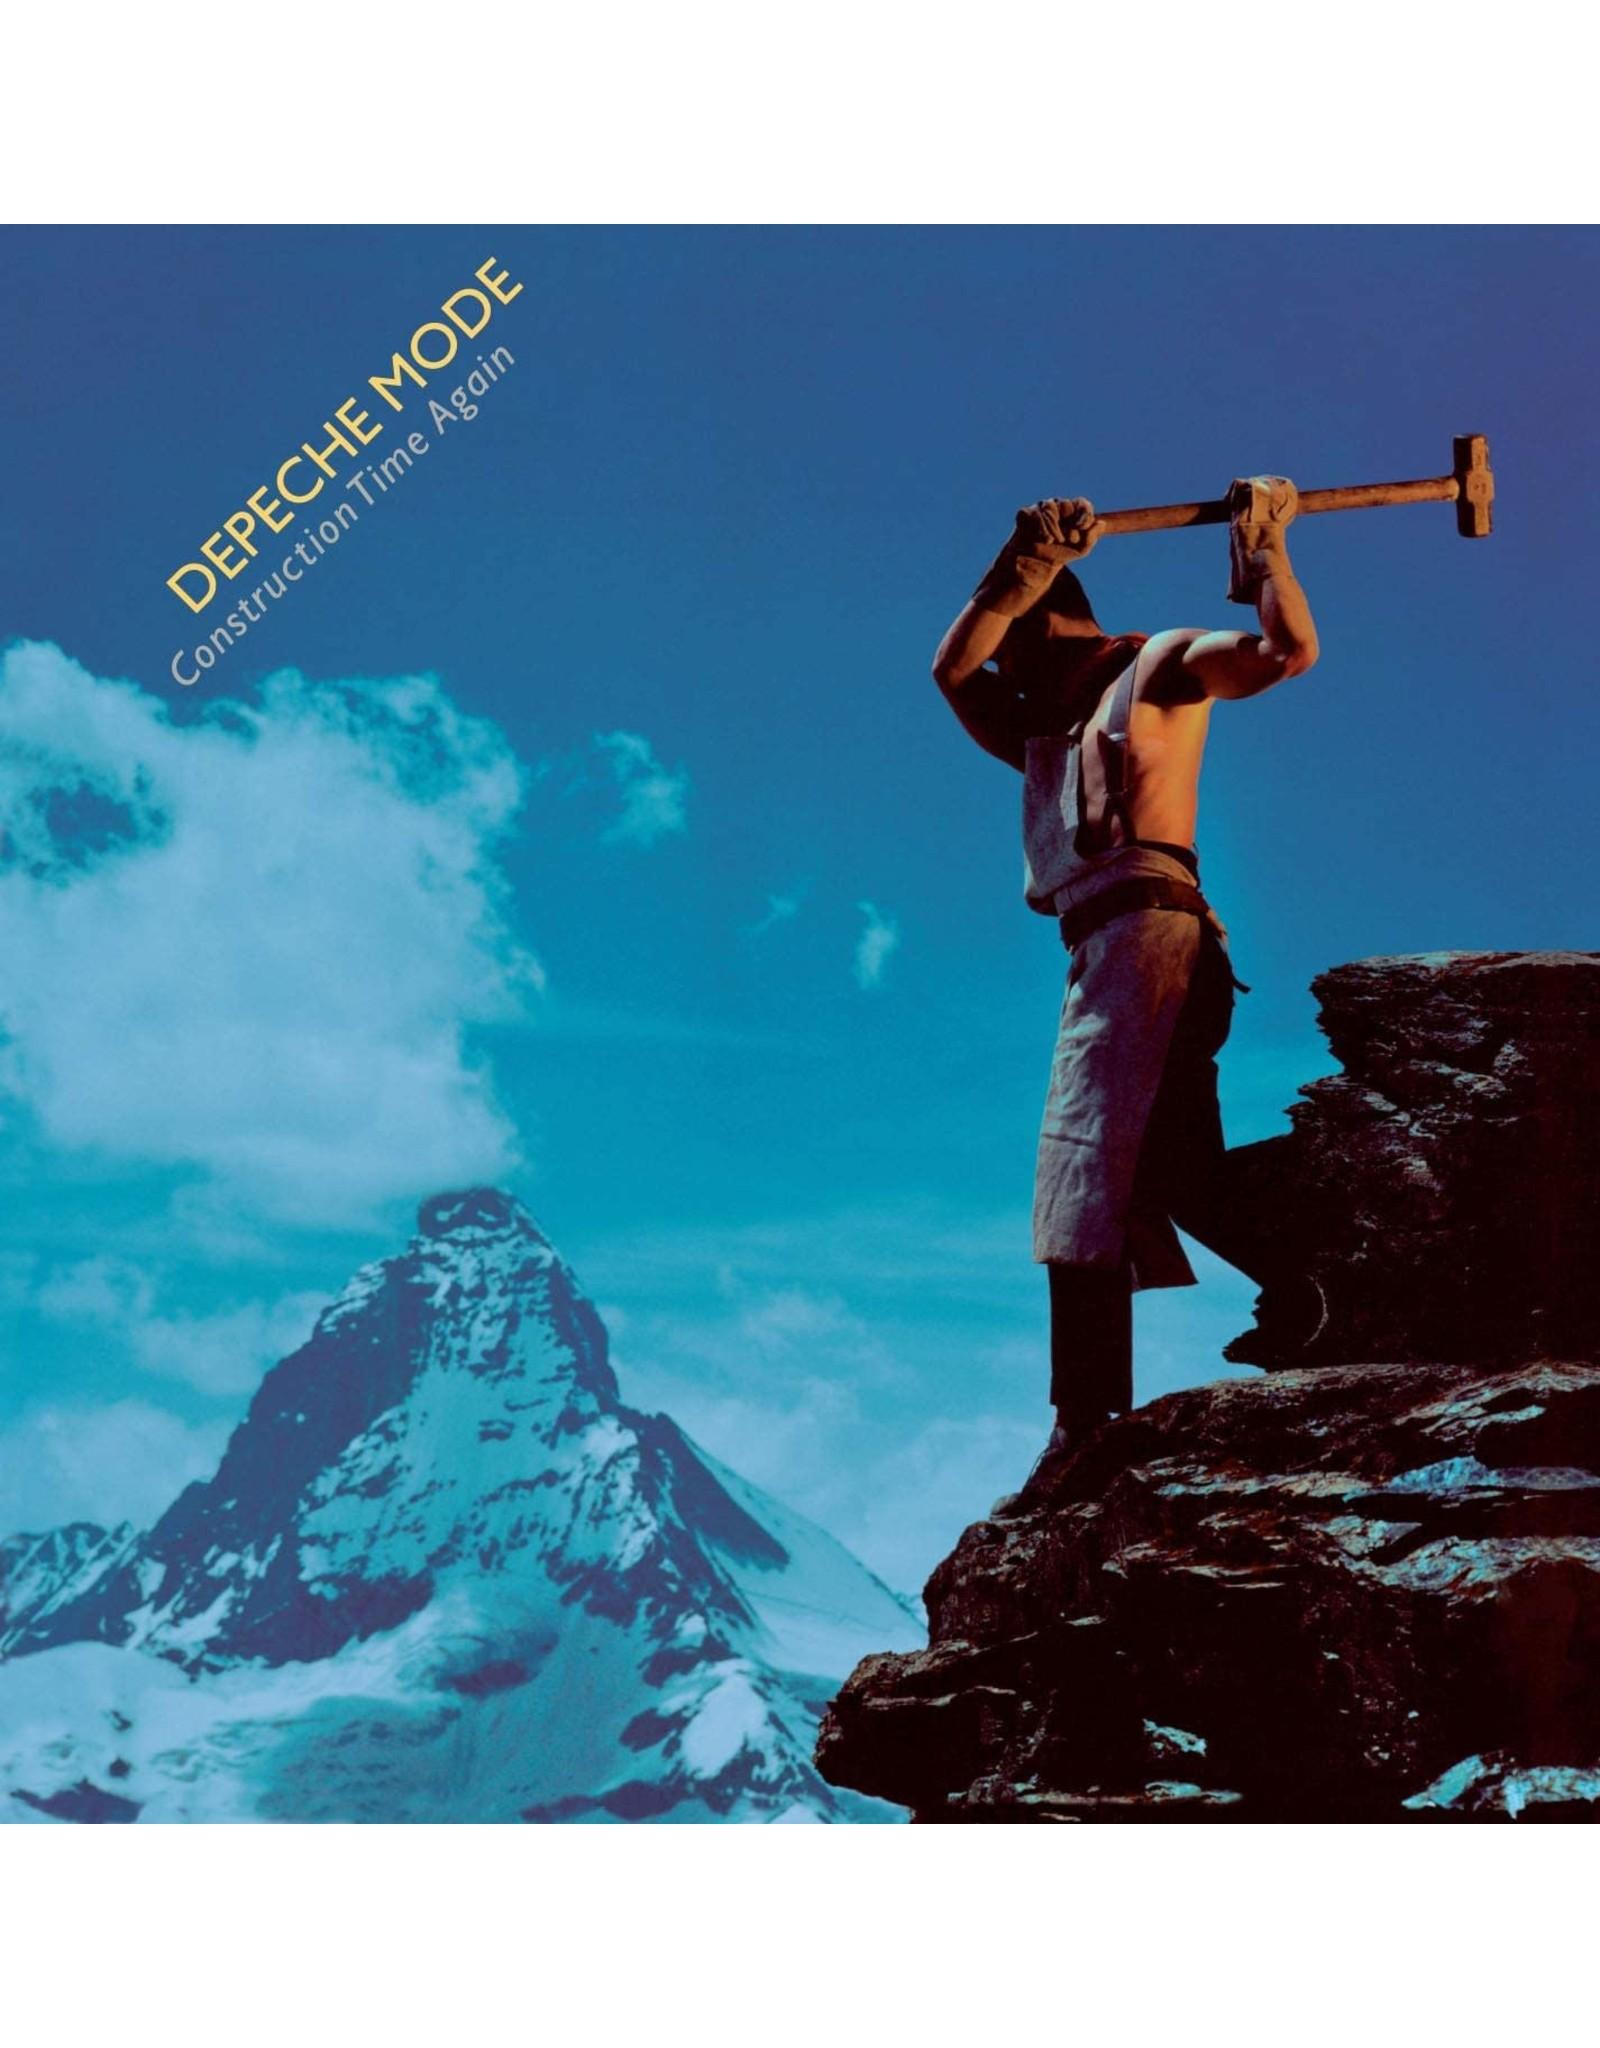 Depeche Mode - Construction Time Again